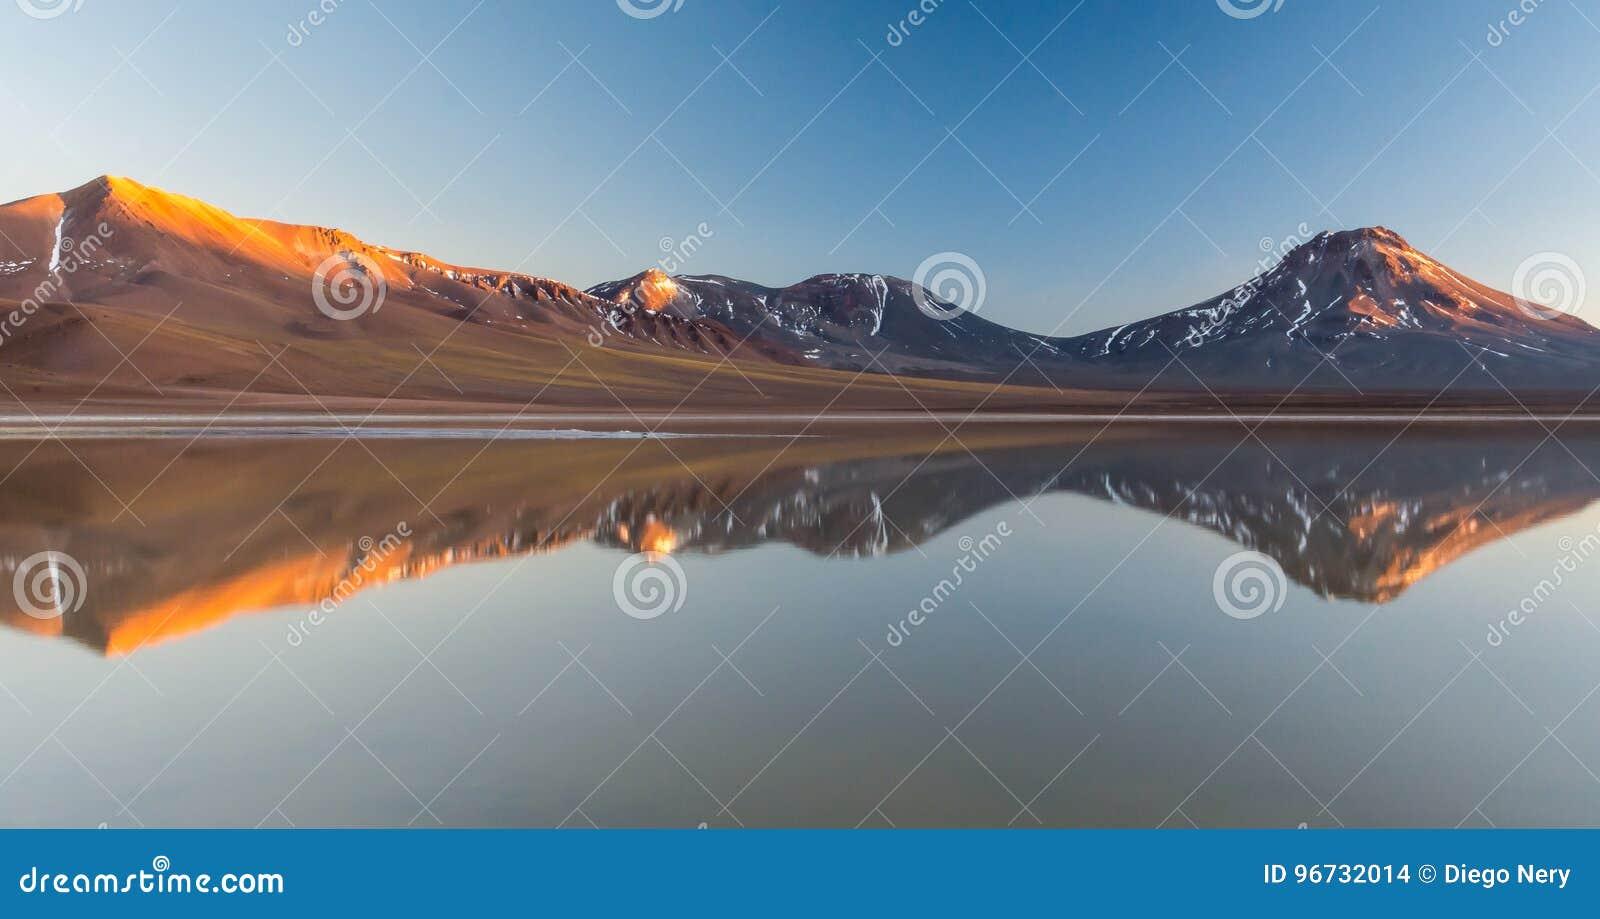 Sonnenaufgang in Laguna LejÃa, Atacama-Wüste mit Volcano Laskar